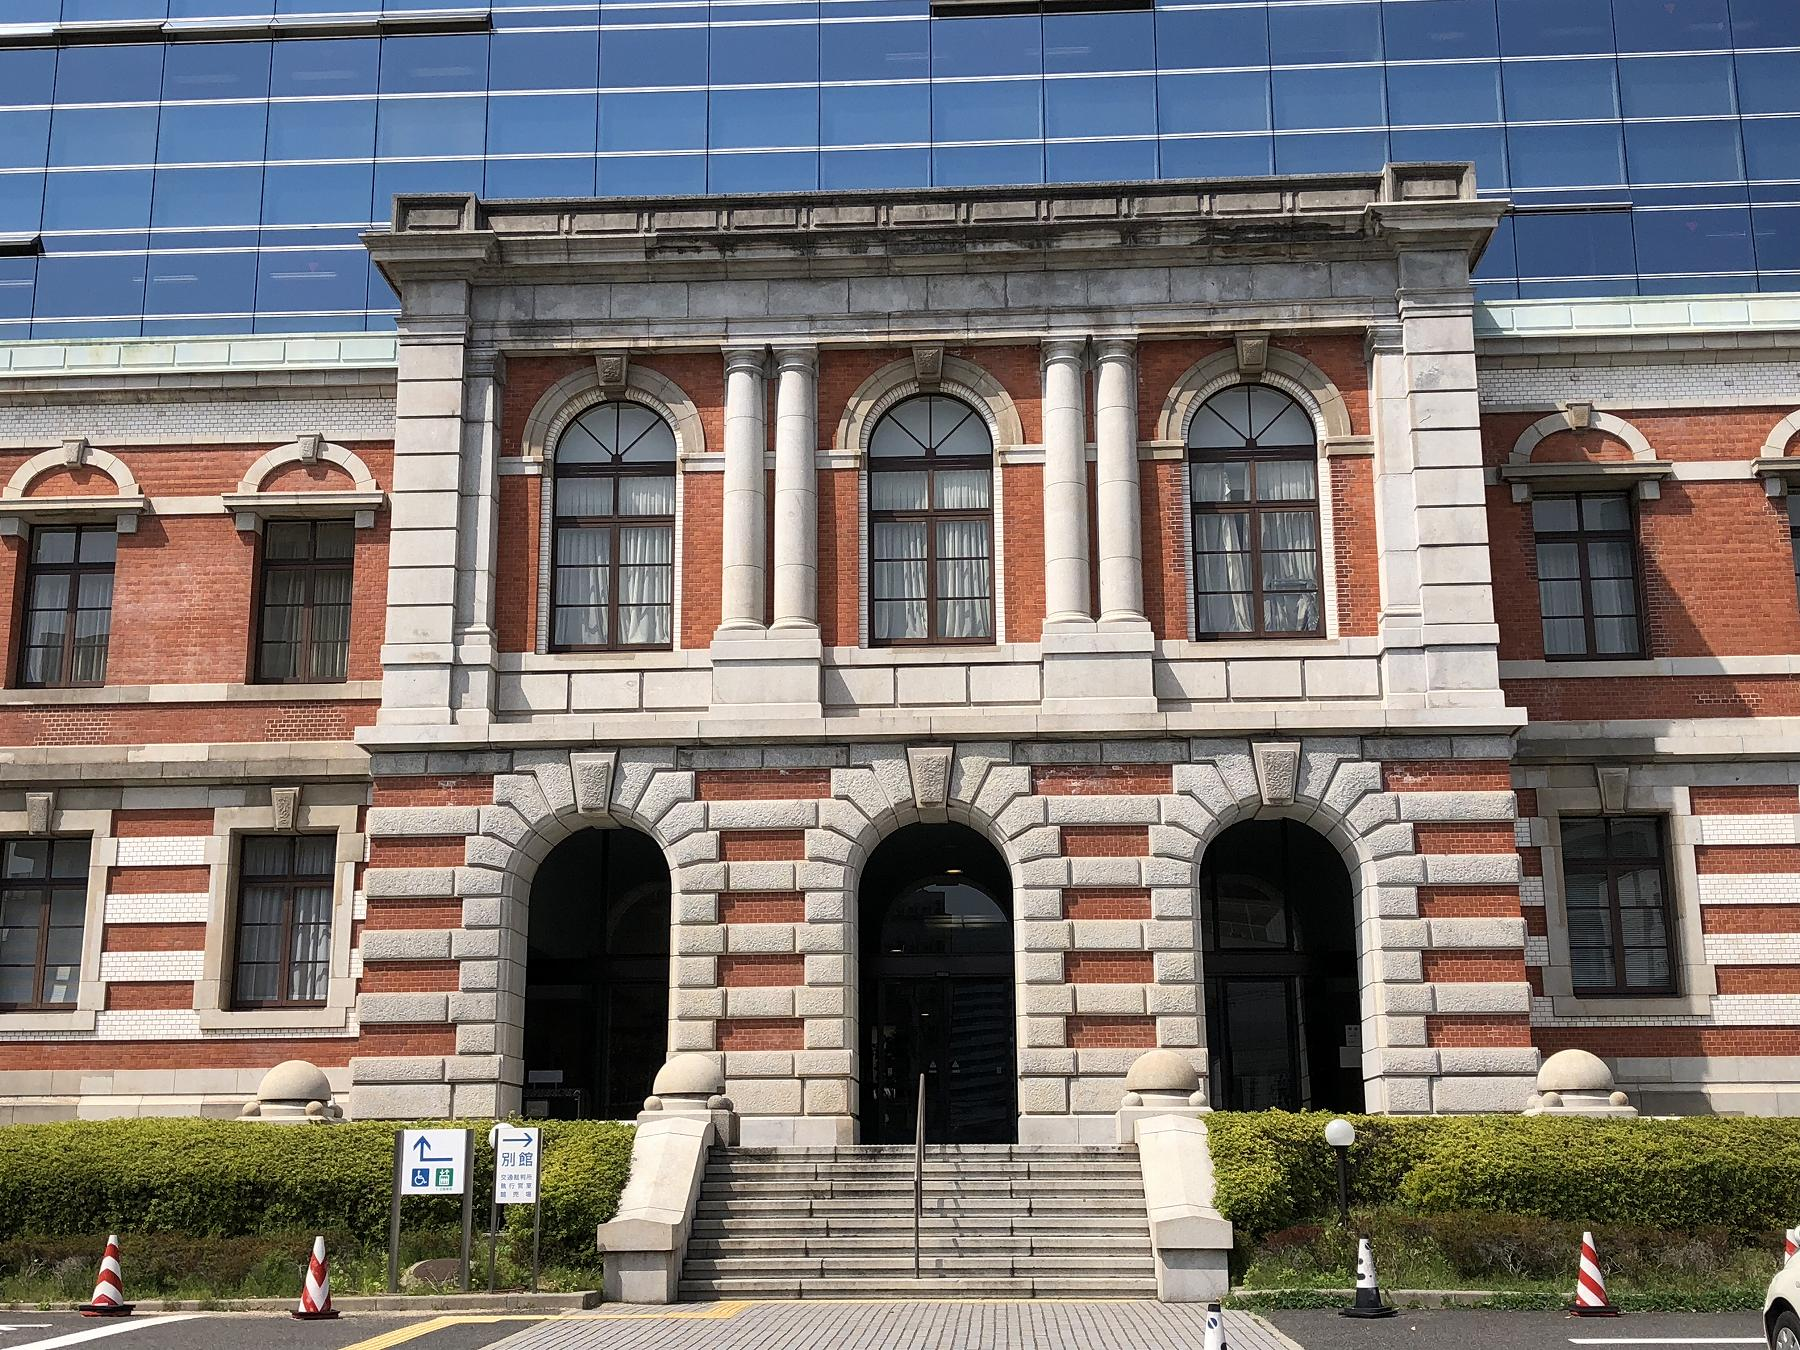 美しい近代建築の建物をご紹介「神戸地方裁判所」&「神戸教会」 #近代建築 #産業遺産 #神戸観光